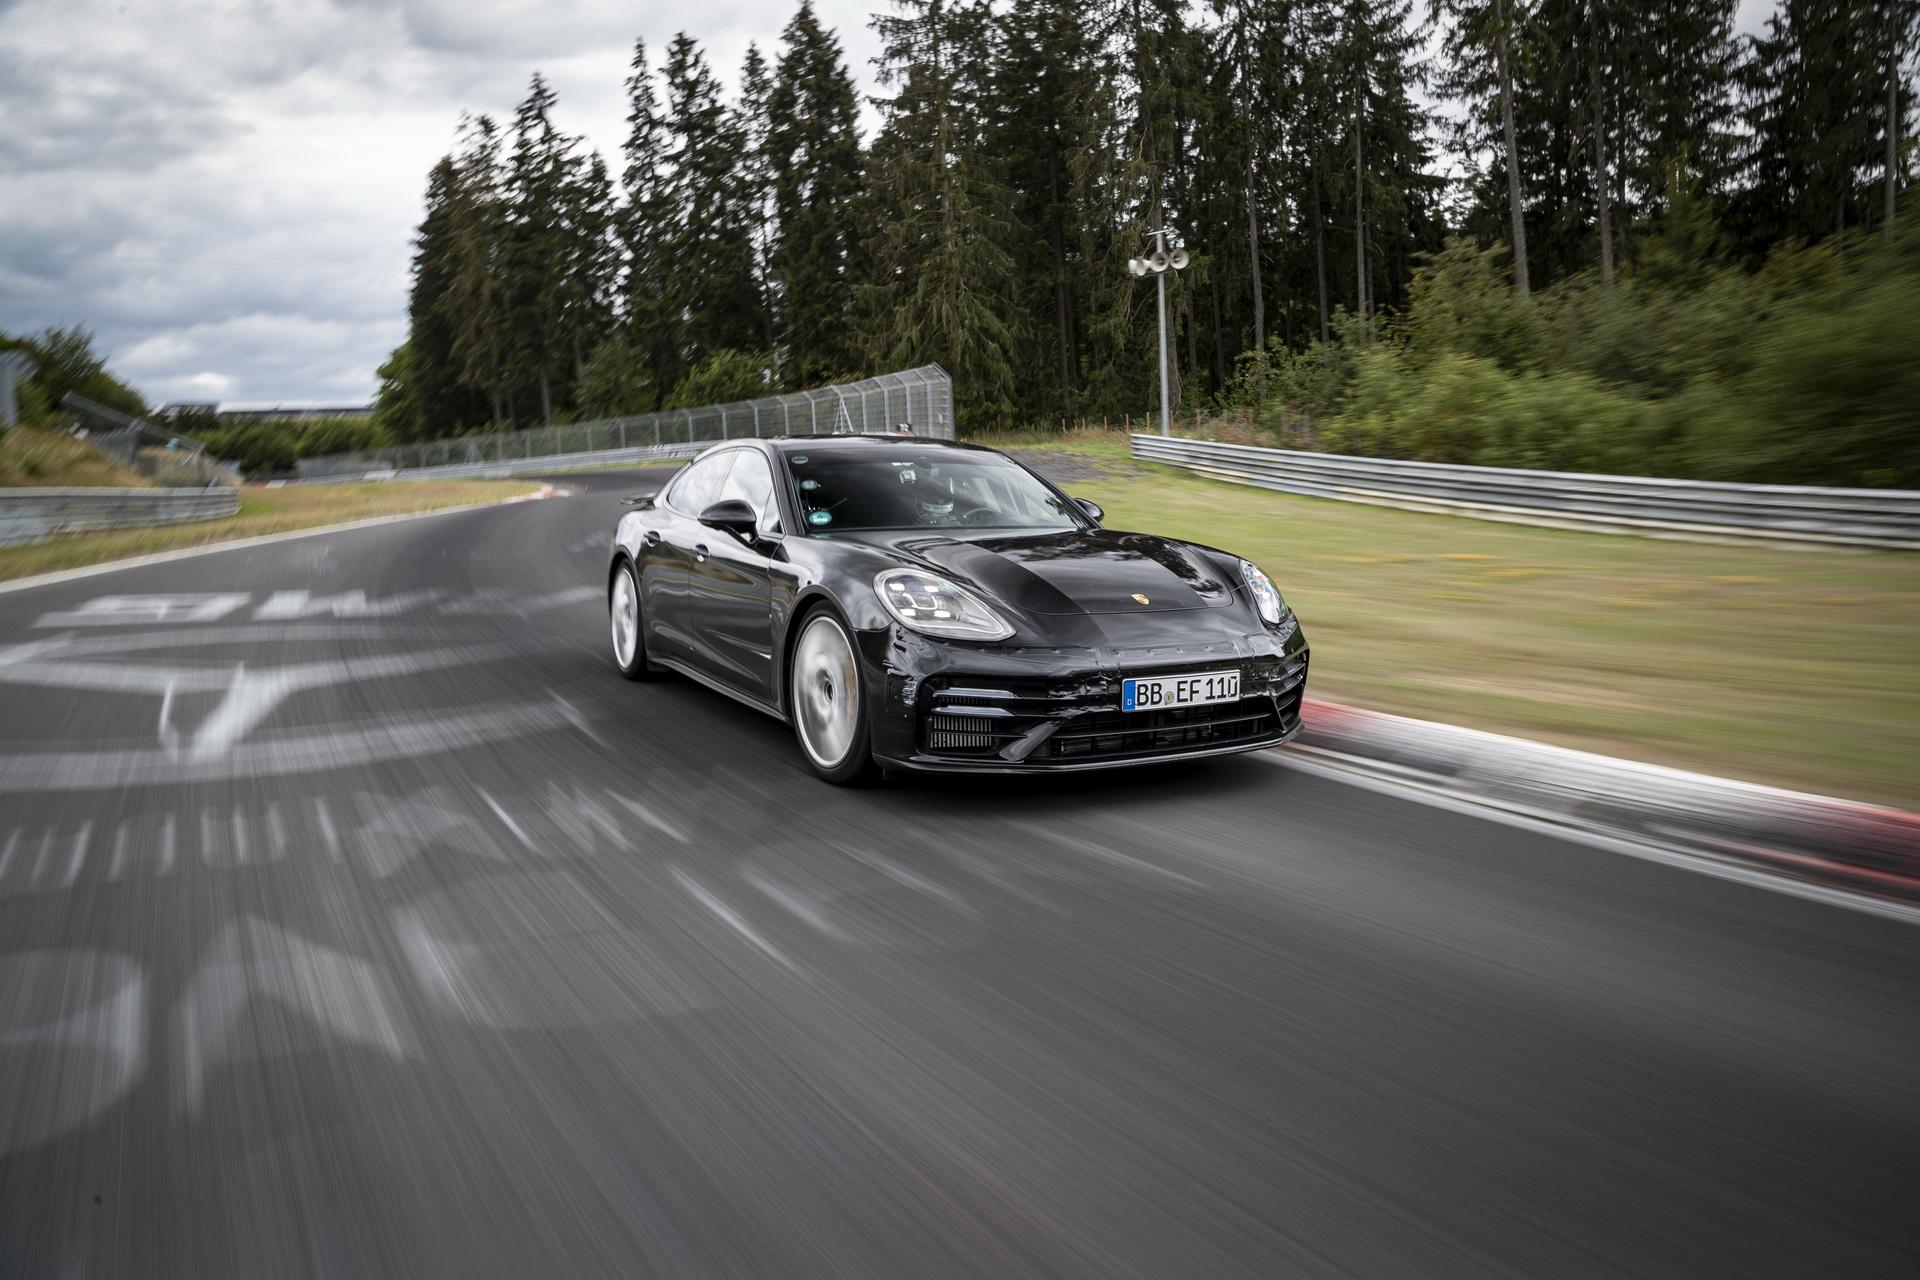 2021-porsche-panamera-nurburgring-nordschleife-record-1